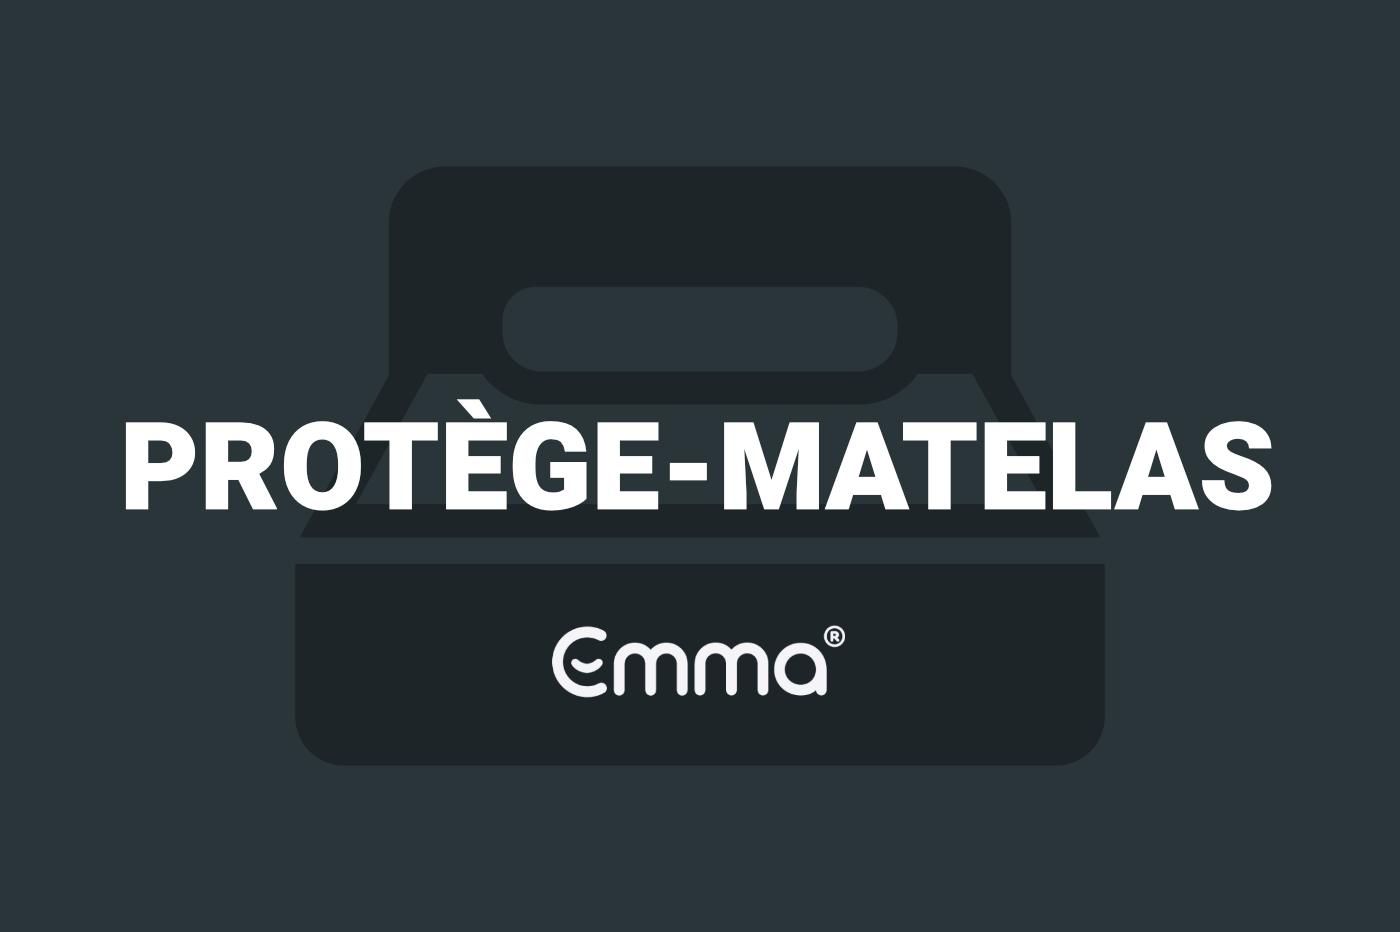 Protège-matelas Emma